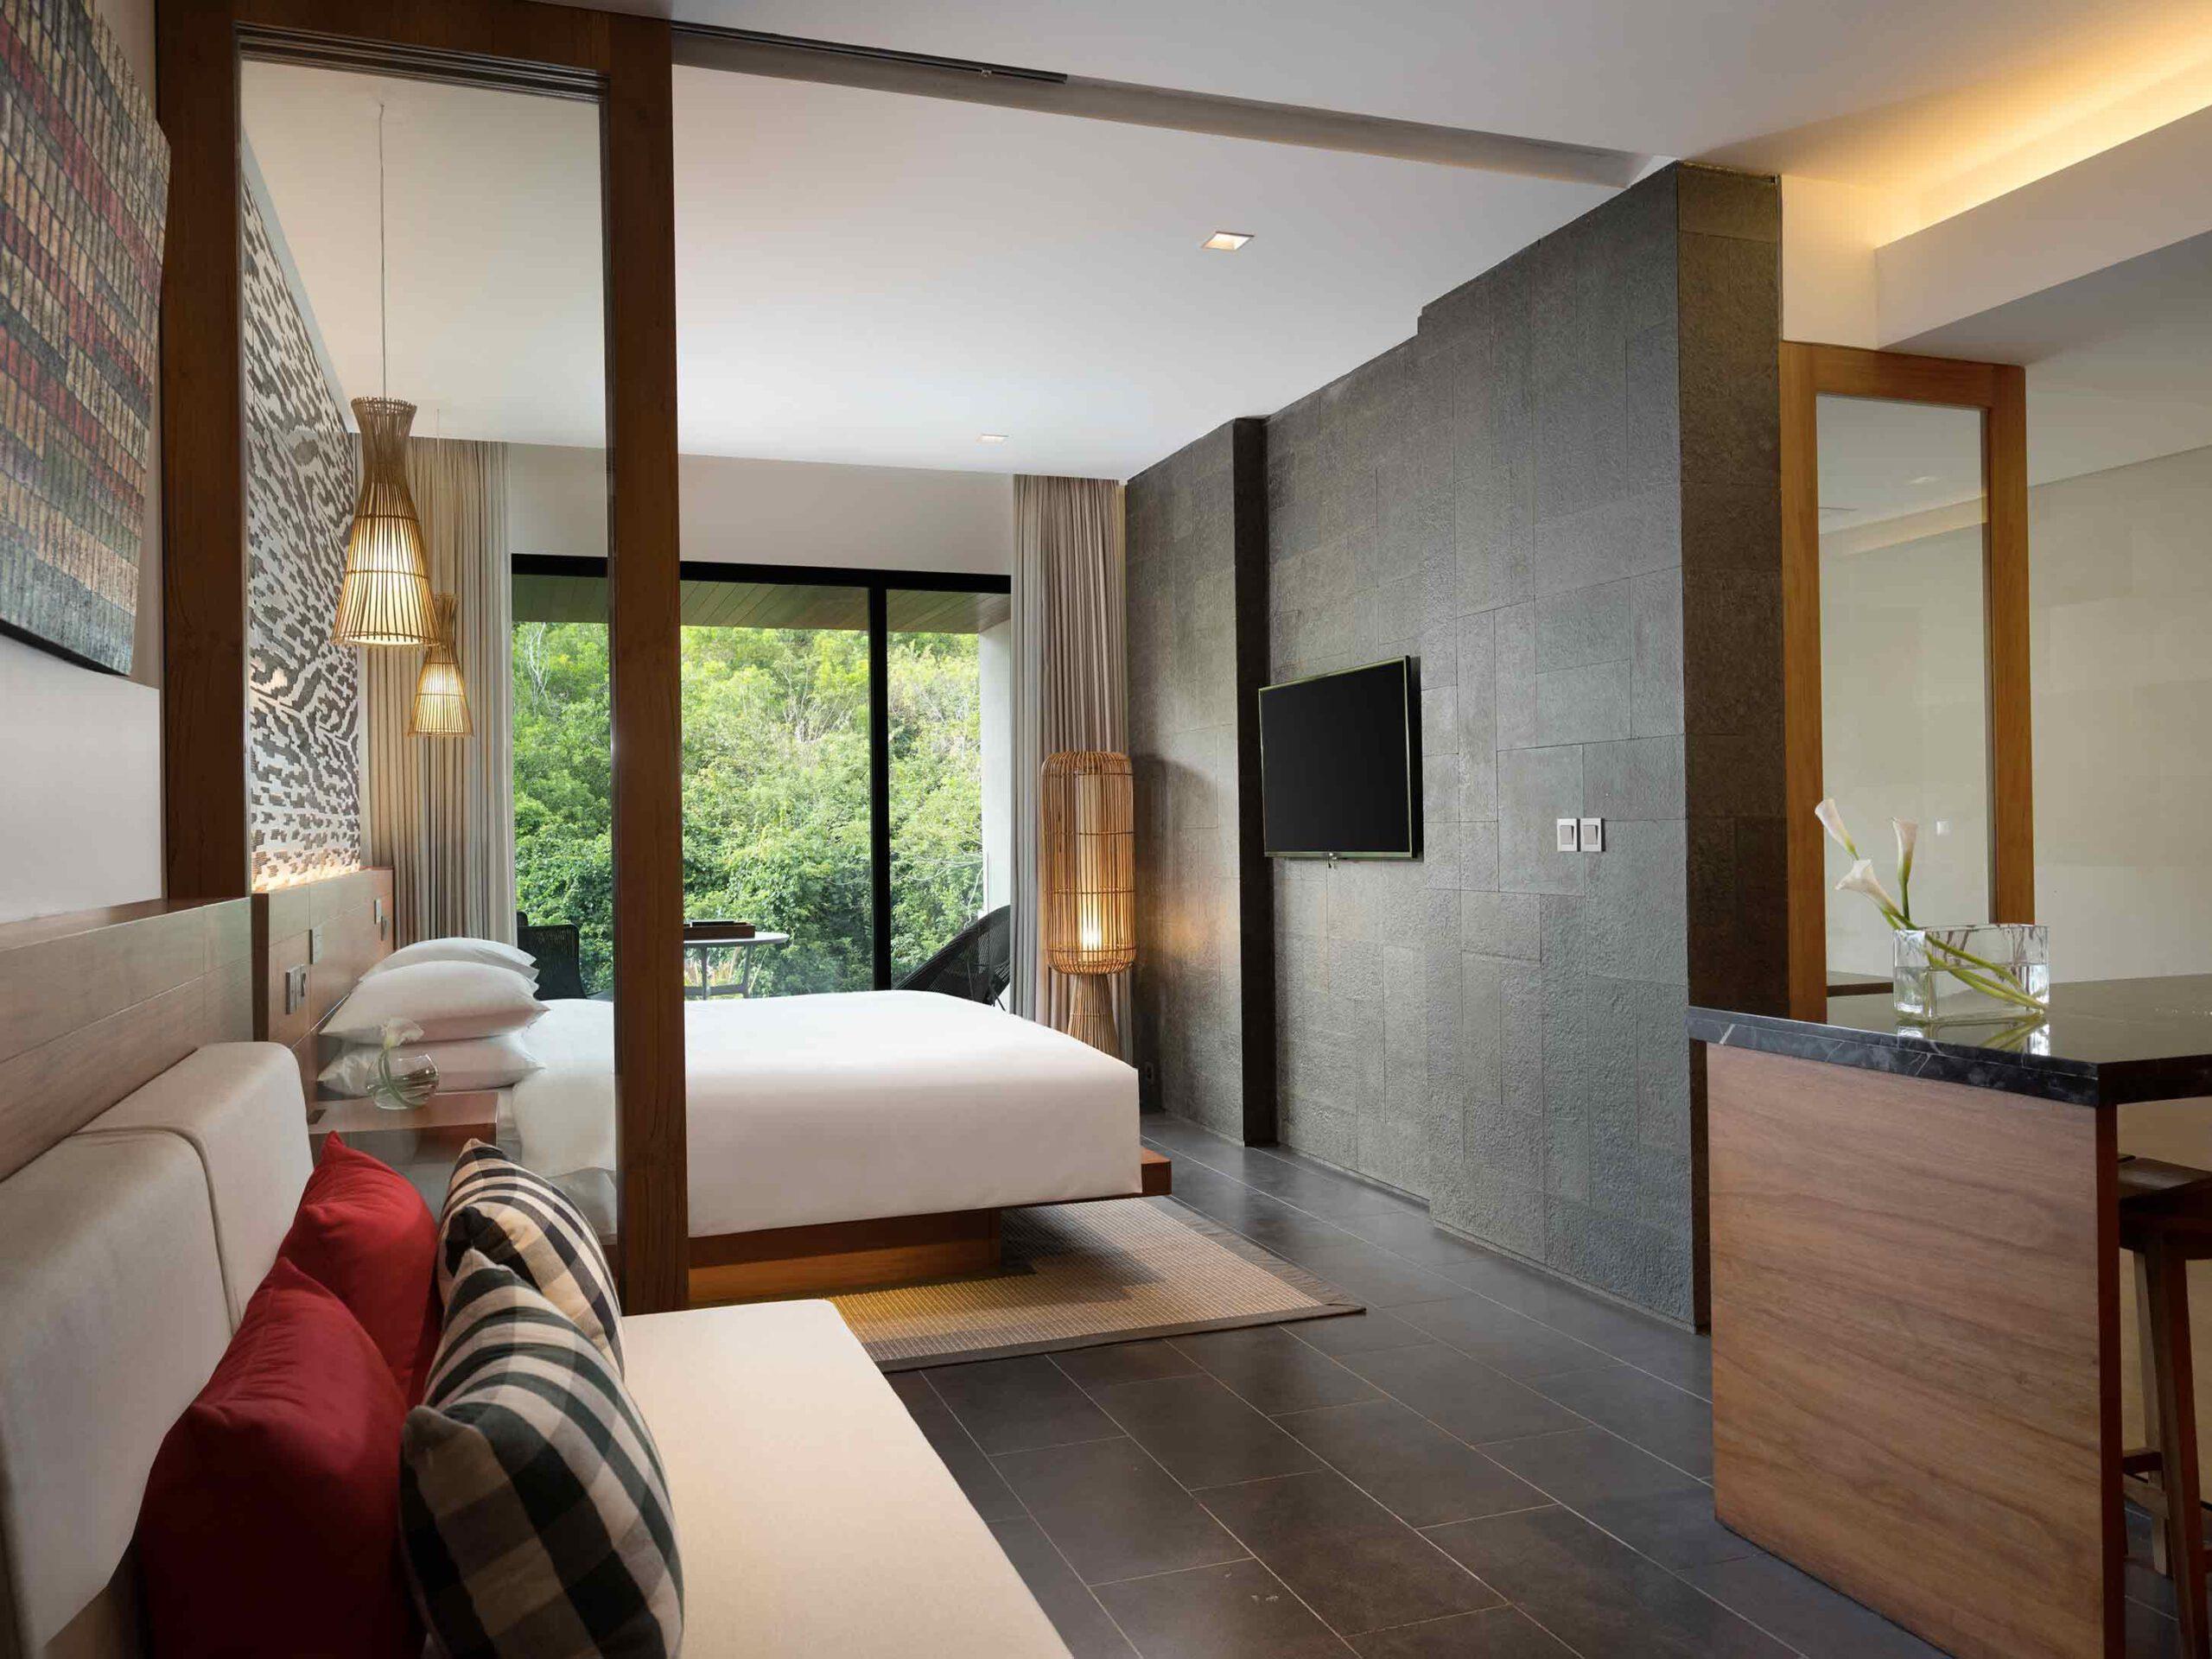 https://www.otdesign.com/wp-content/uploads/2021/04/renaissance-bali-uluwatu-resort-spa-photo3-scaled.jpg